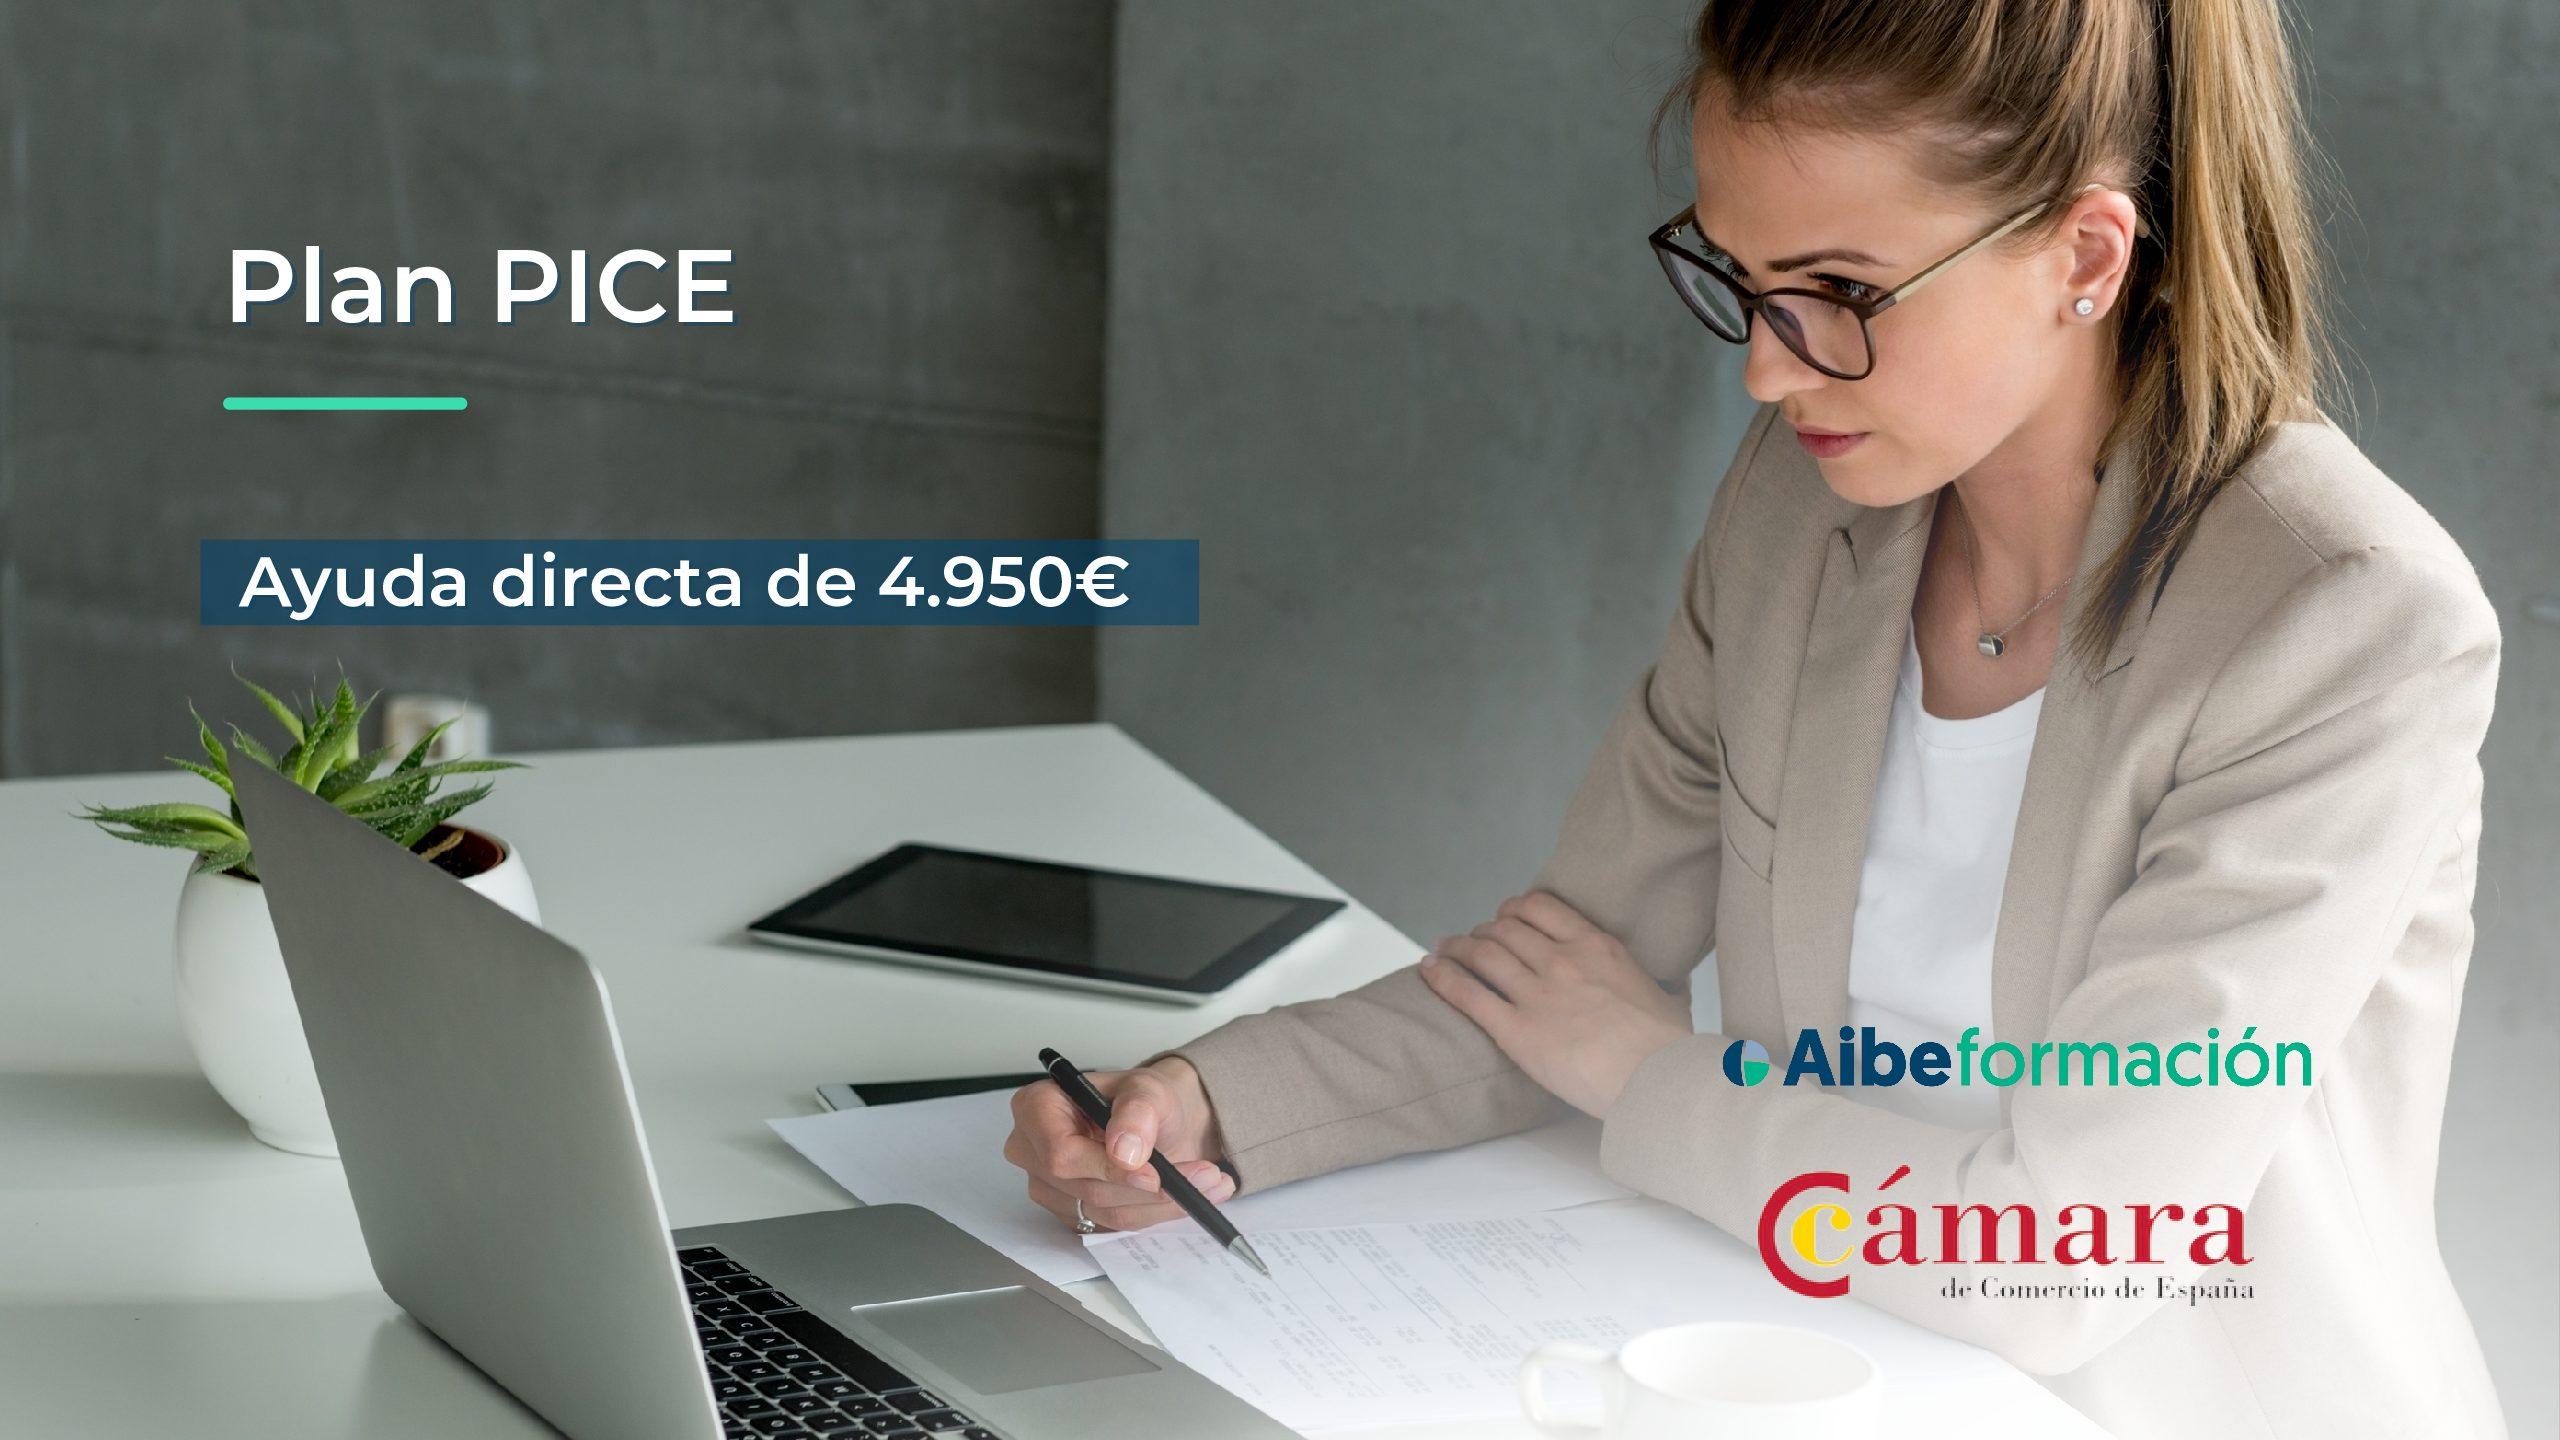 https://www.aibeformacion.com/wp-content/uploads/2021/09/Ayuda-directa-de-4.950€-1-pdf.jpg